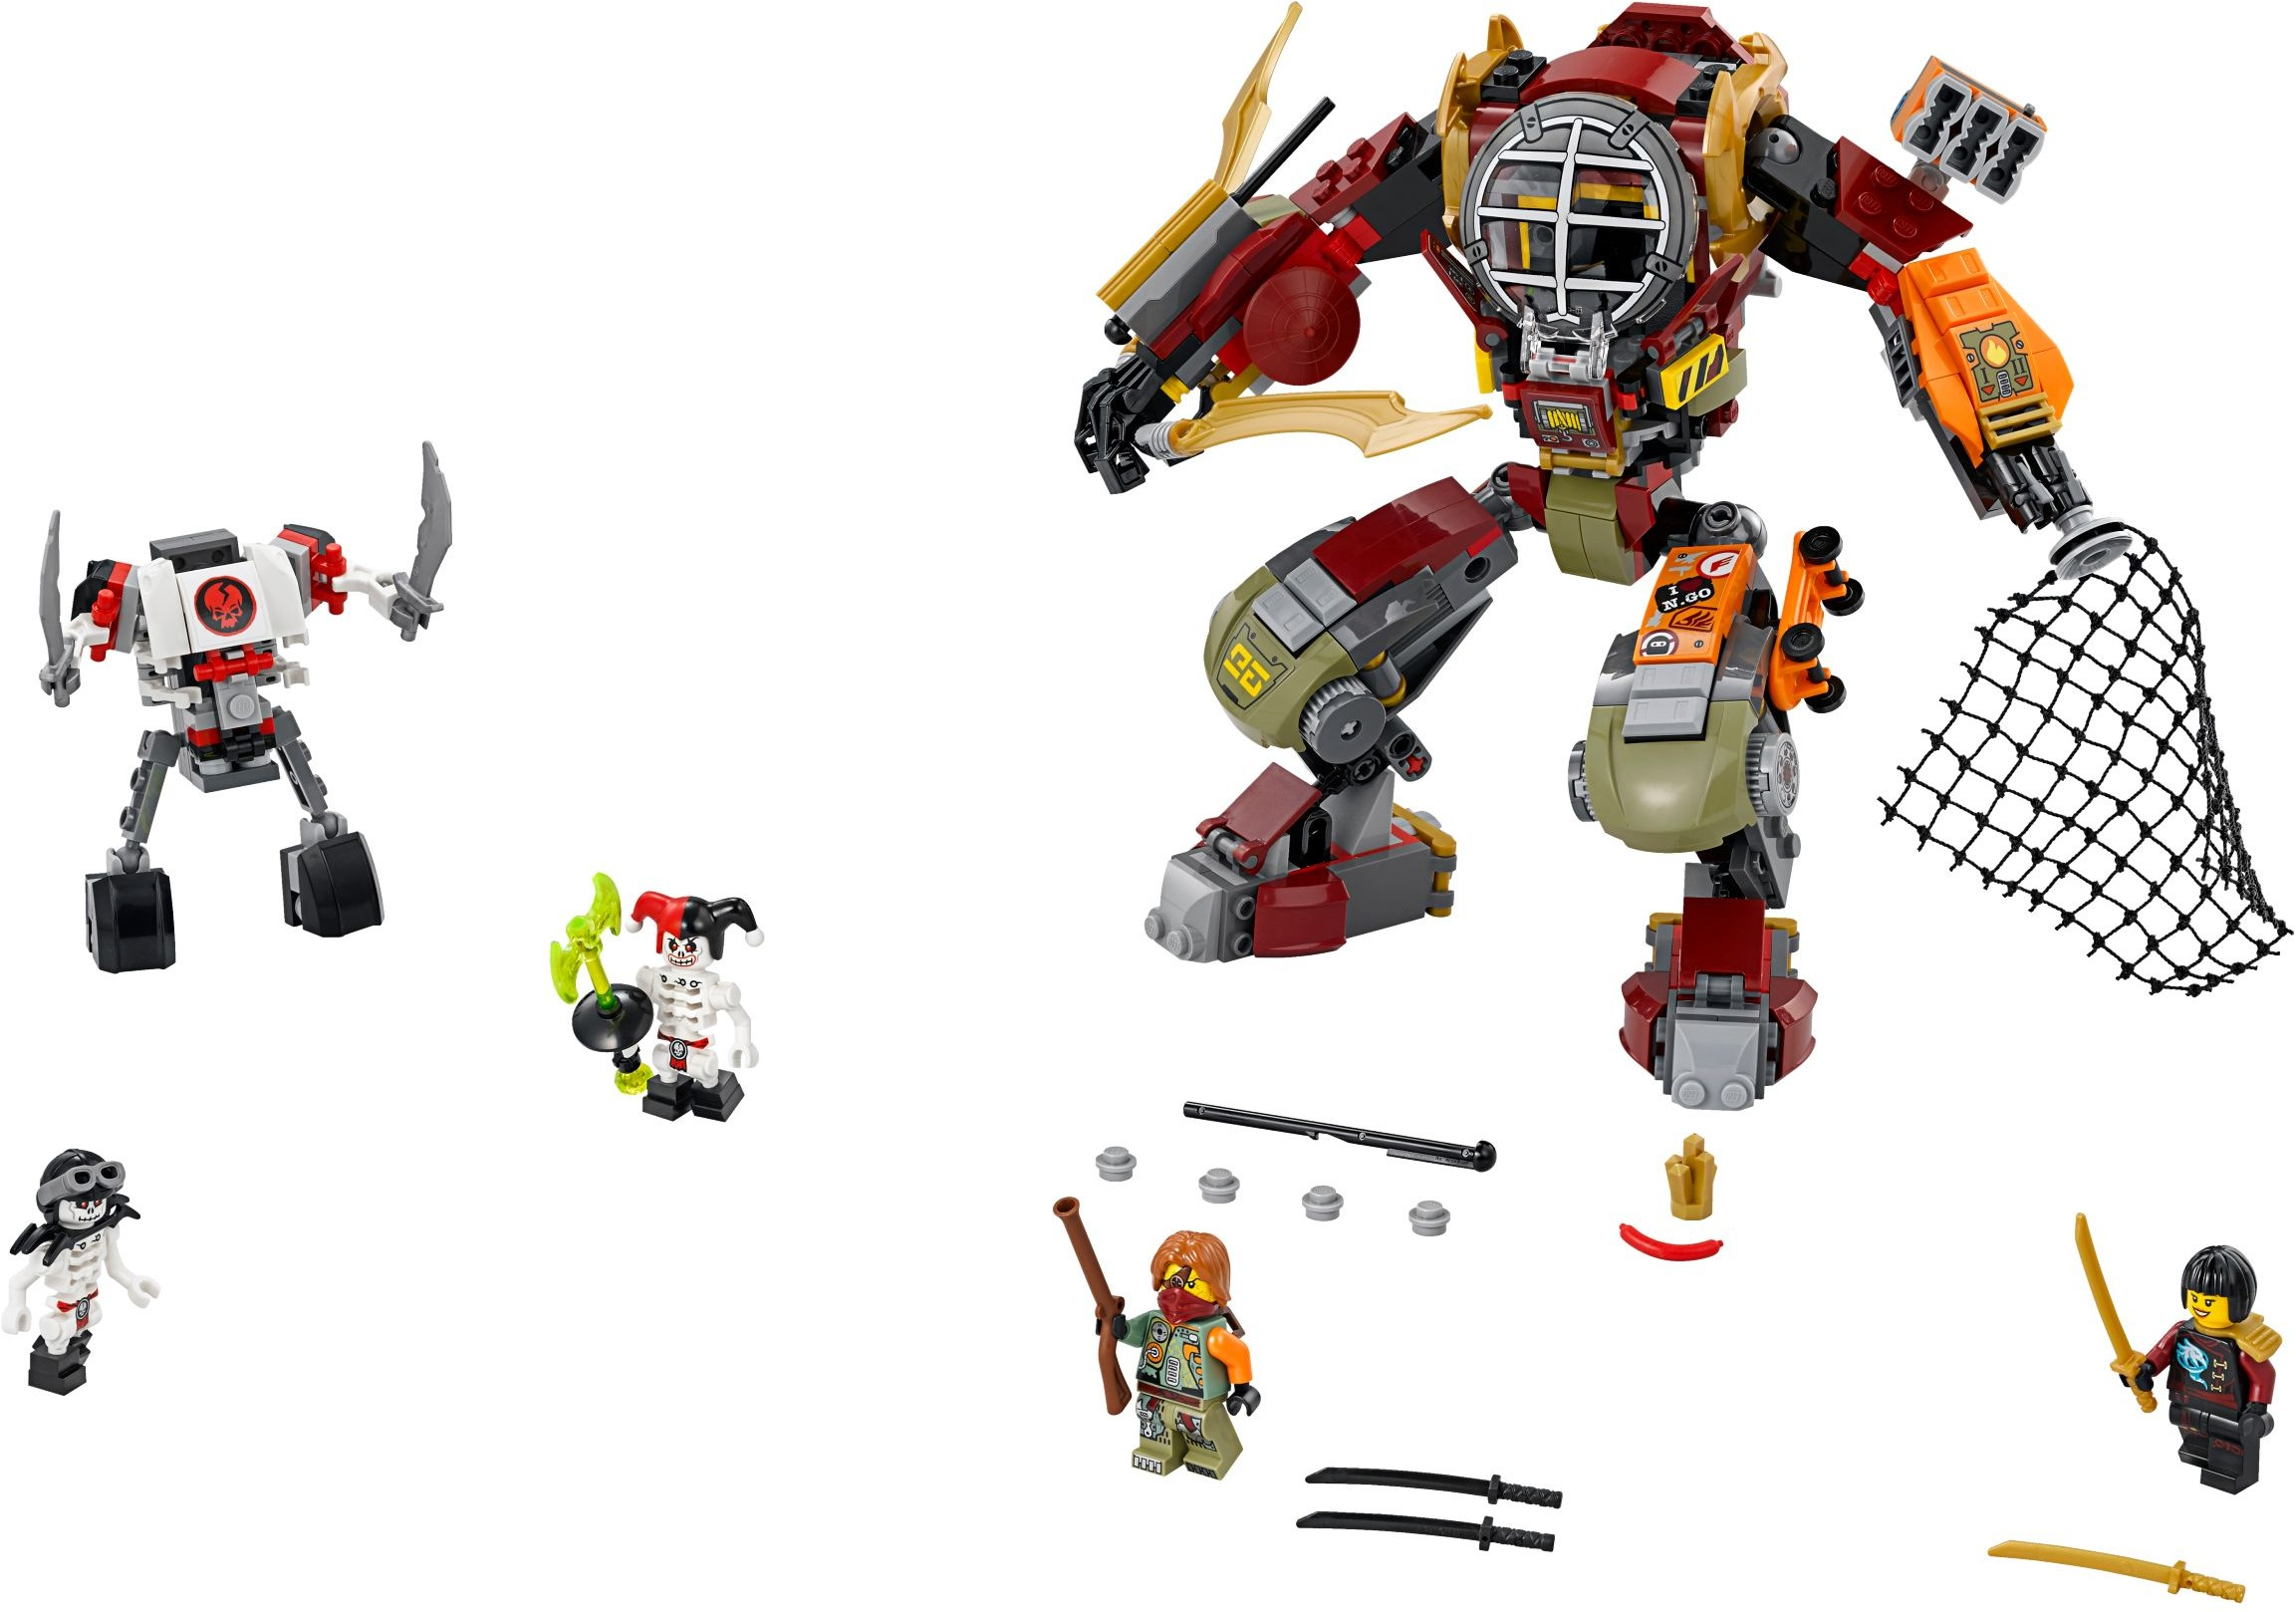 Ninjago 2016 Brickset Lego Set Guide And Database 70594 The Lighthouse Siege Salvage Mec